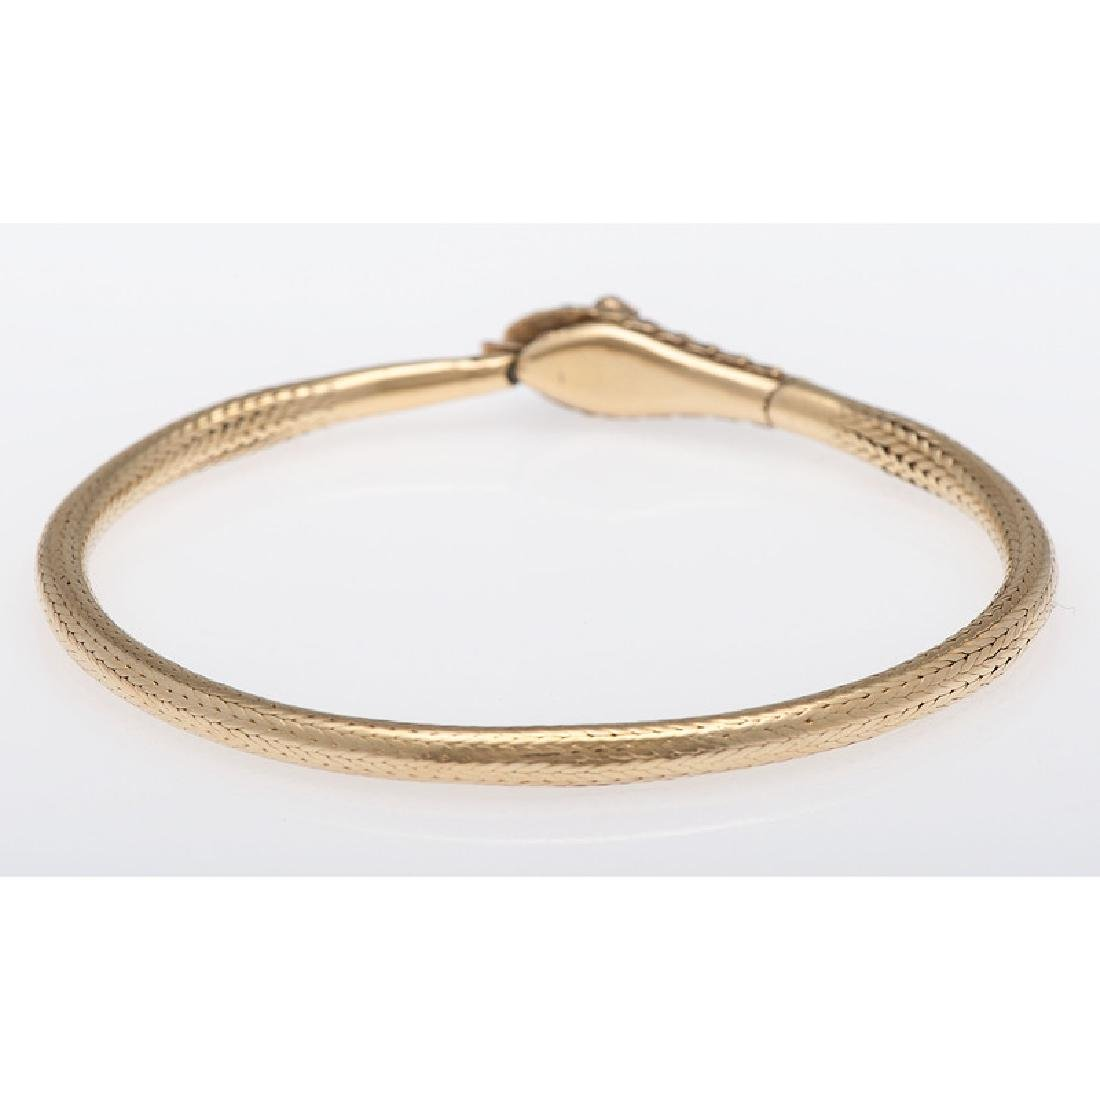 18 Karat Yellow Gold Victorian Serpent Snake Bracelet - 3